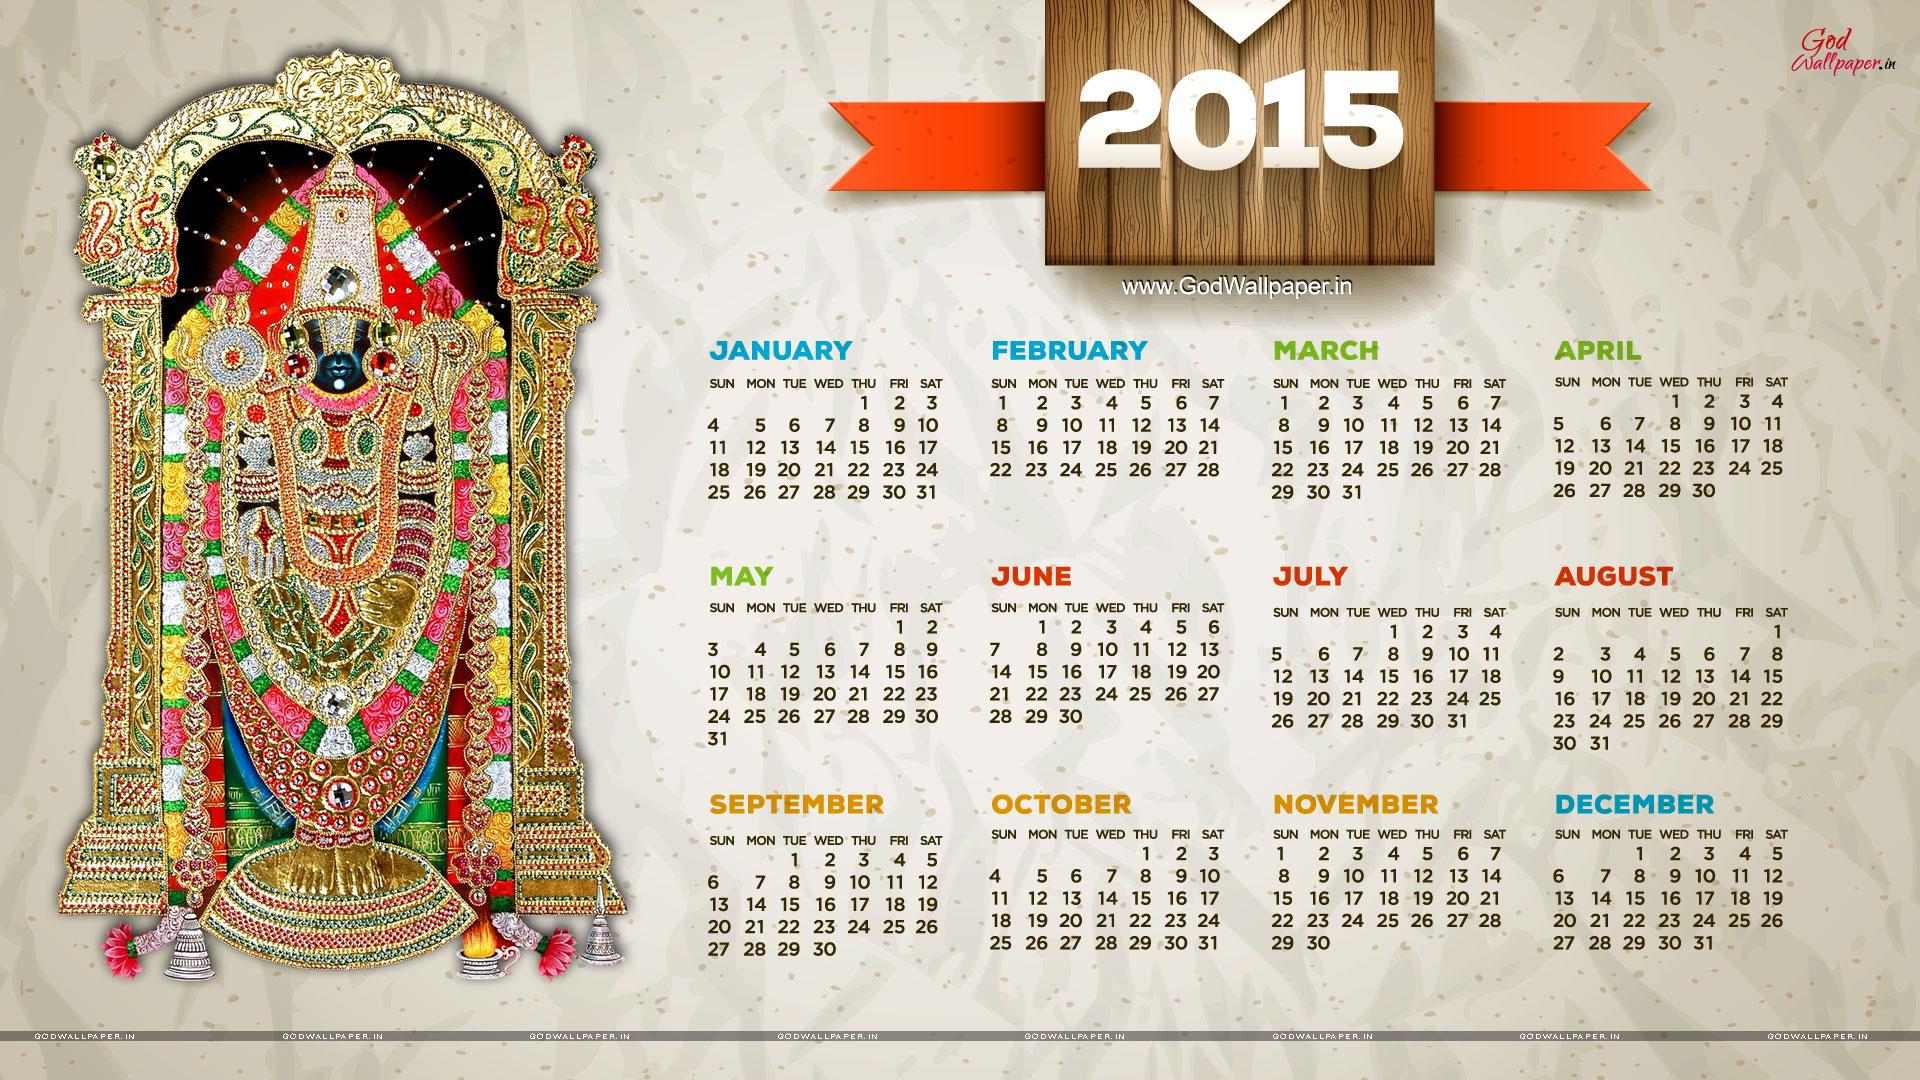 desktop wallpaper calendar 2015 free download